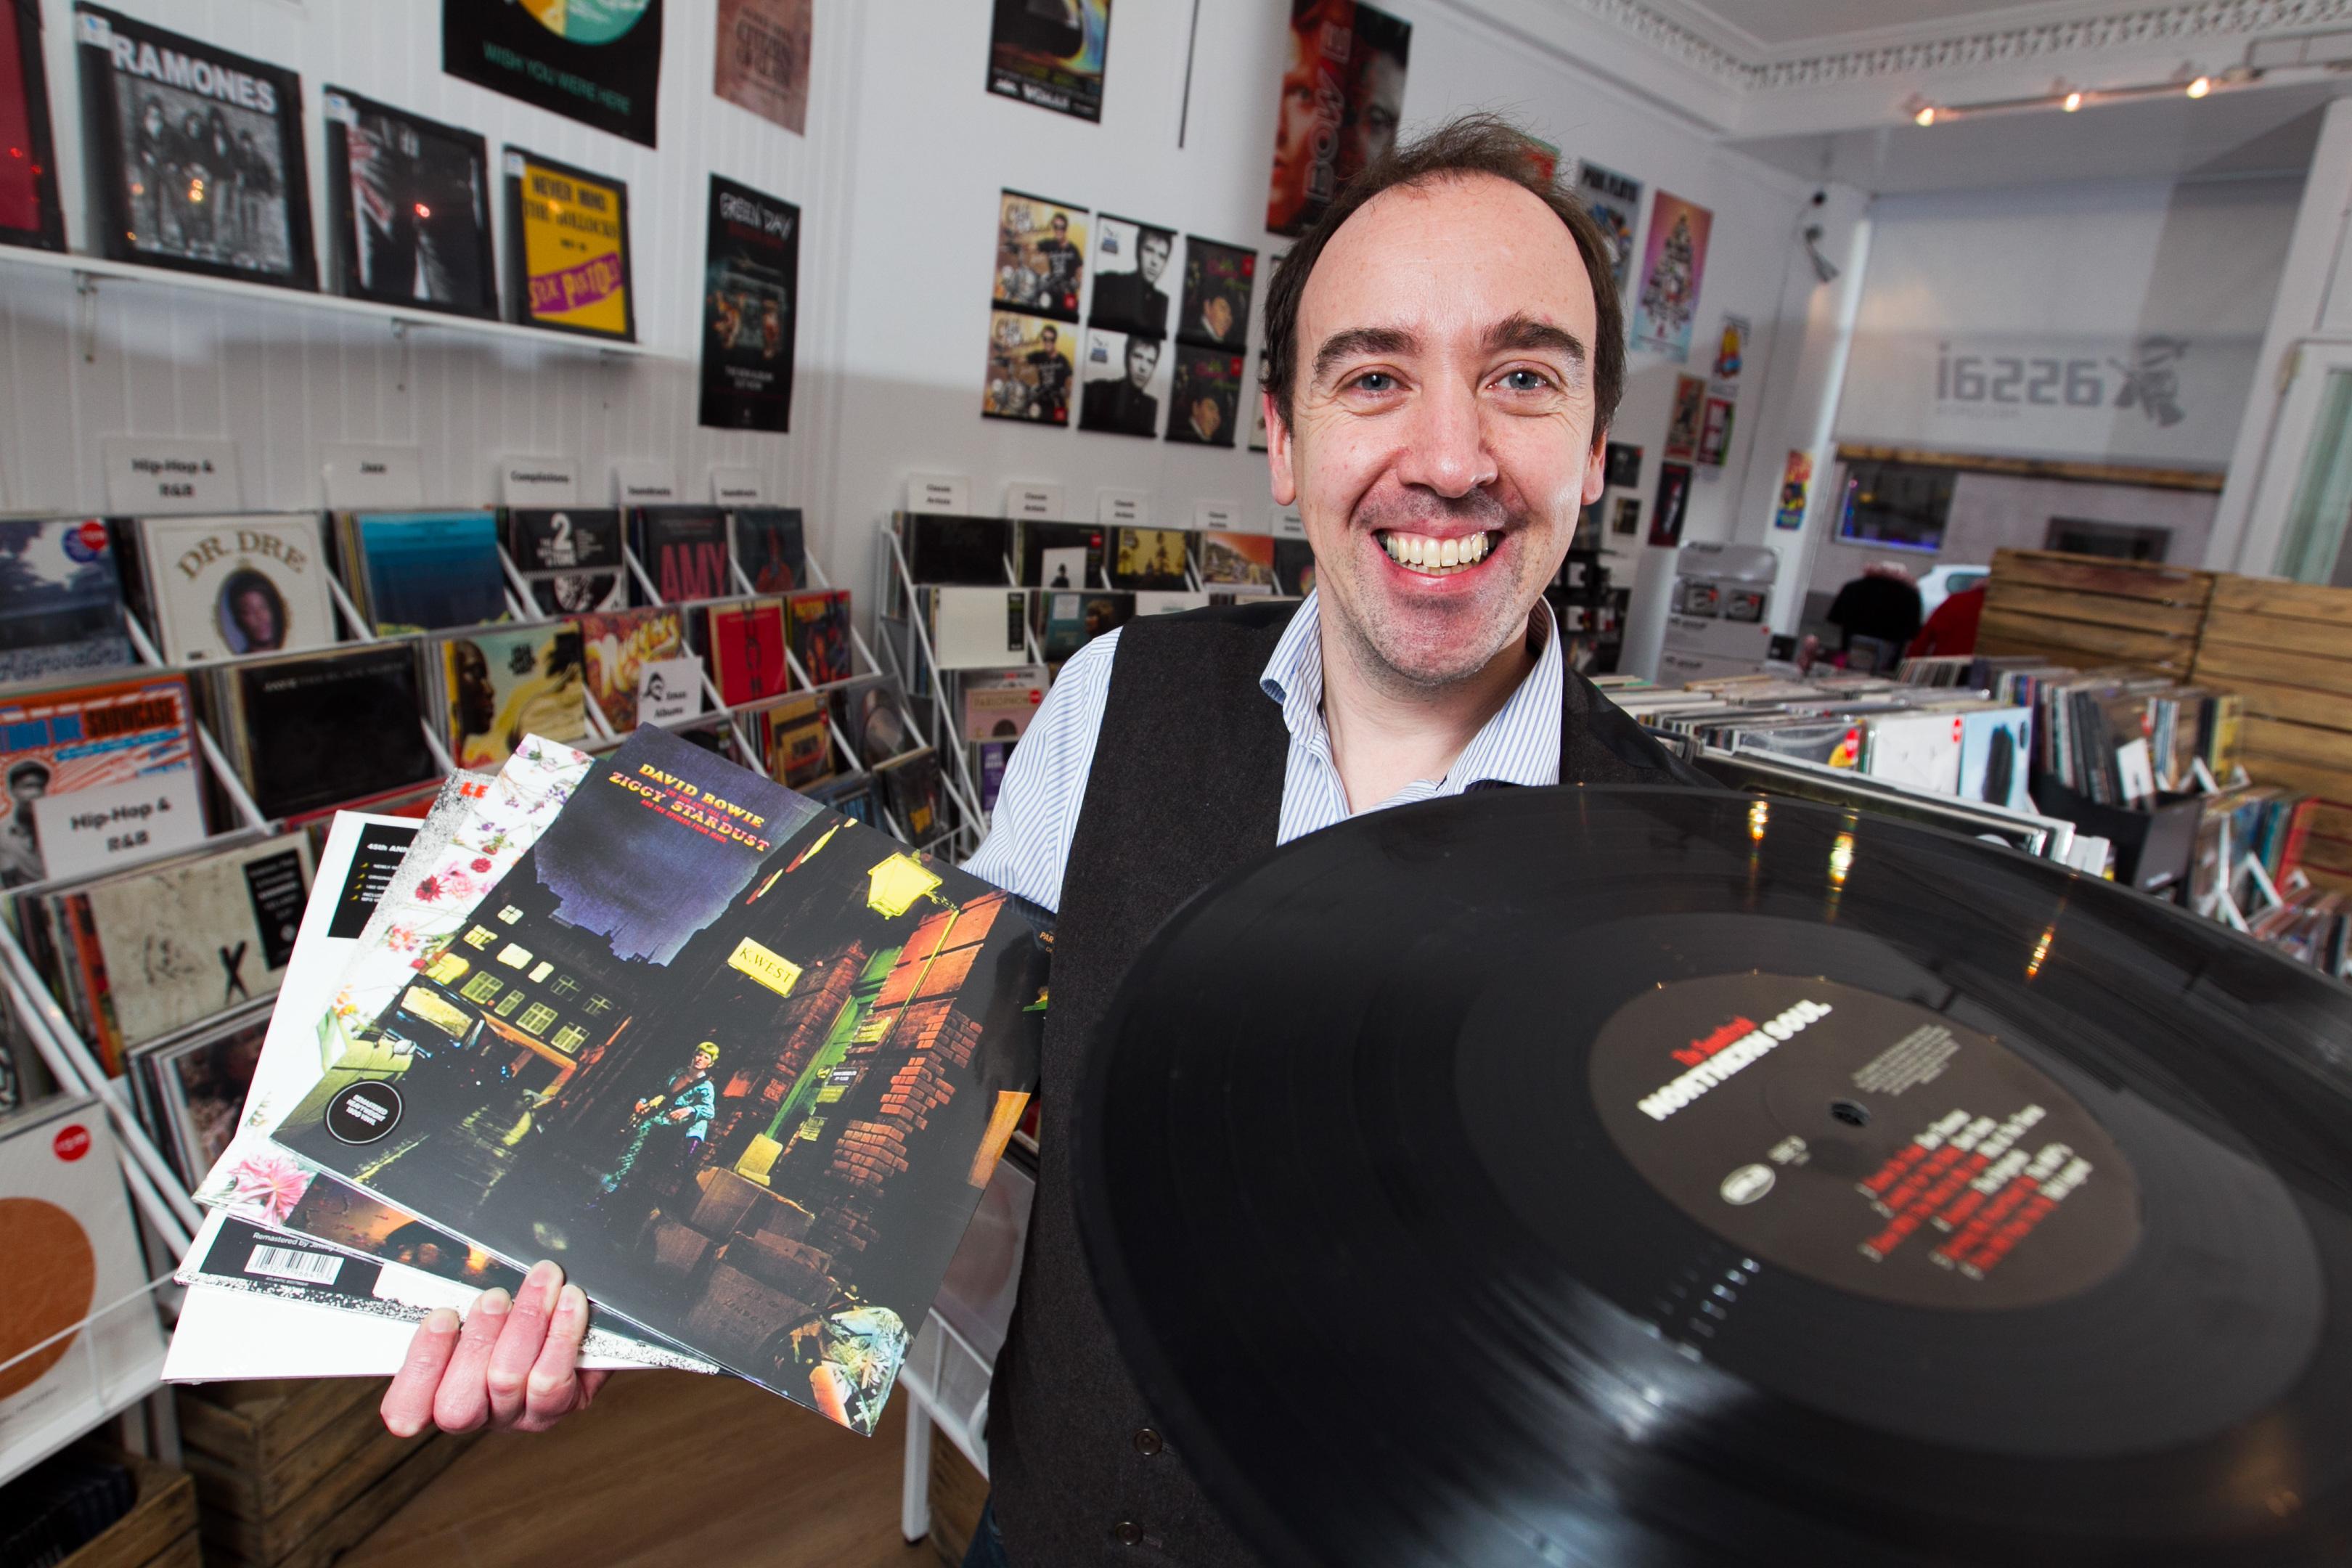 Keith Ingram, owner of Assai record shop